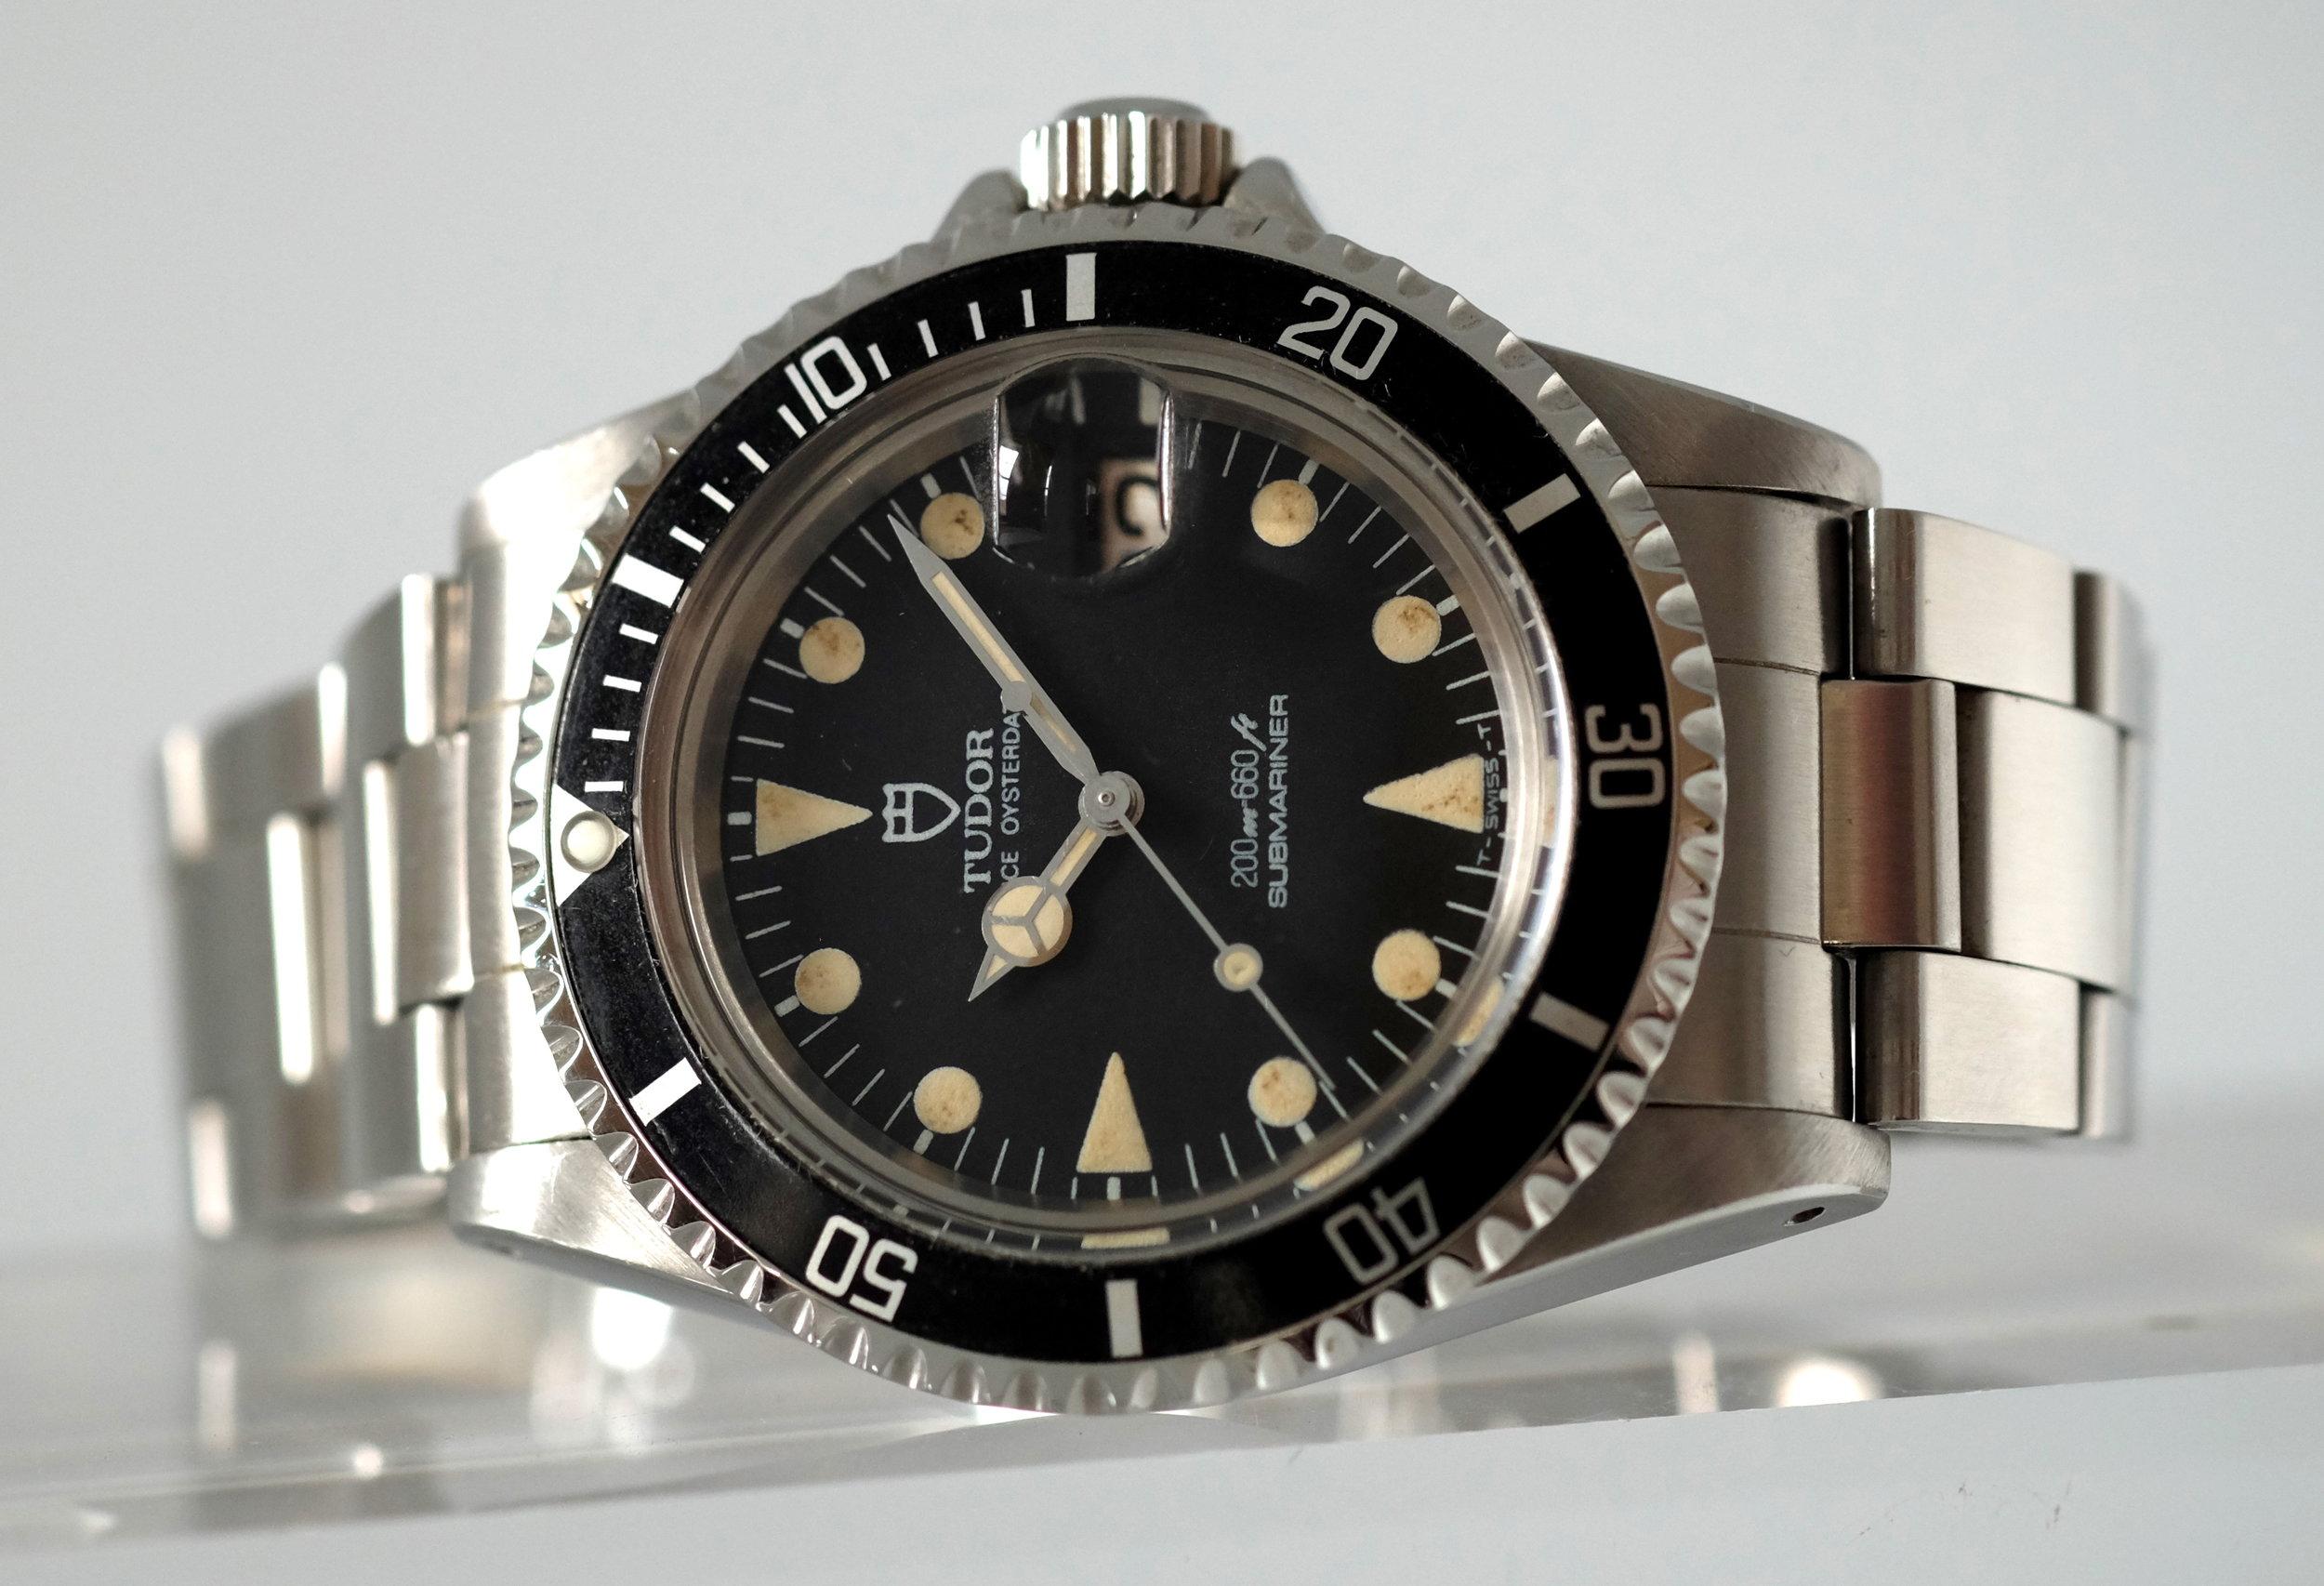 Tudor Submariner Oysterdate Ref. 79090   SOLD